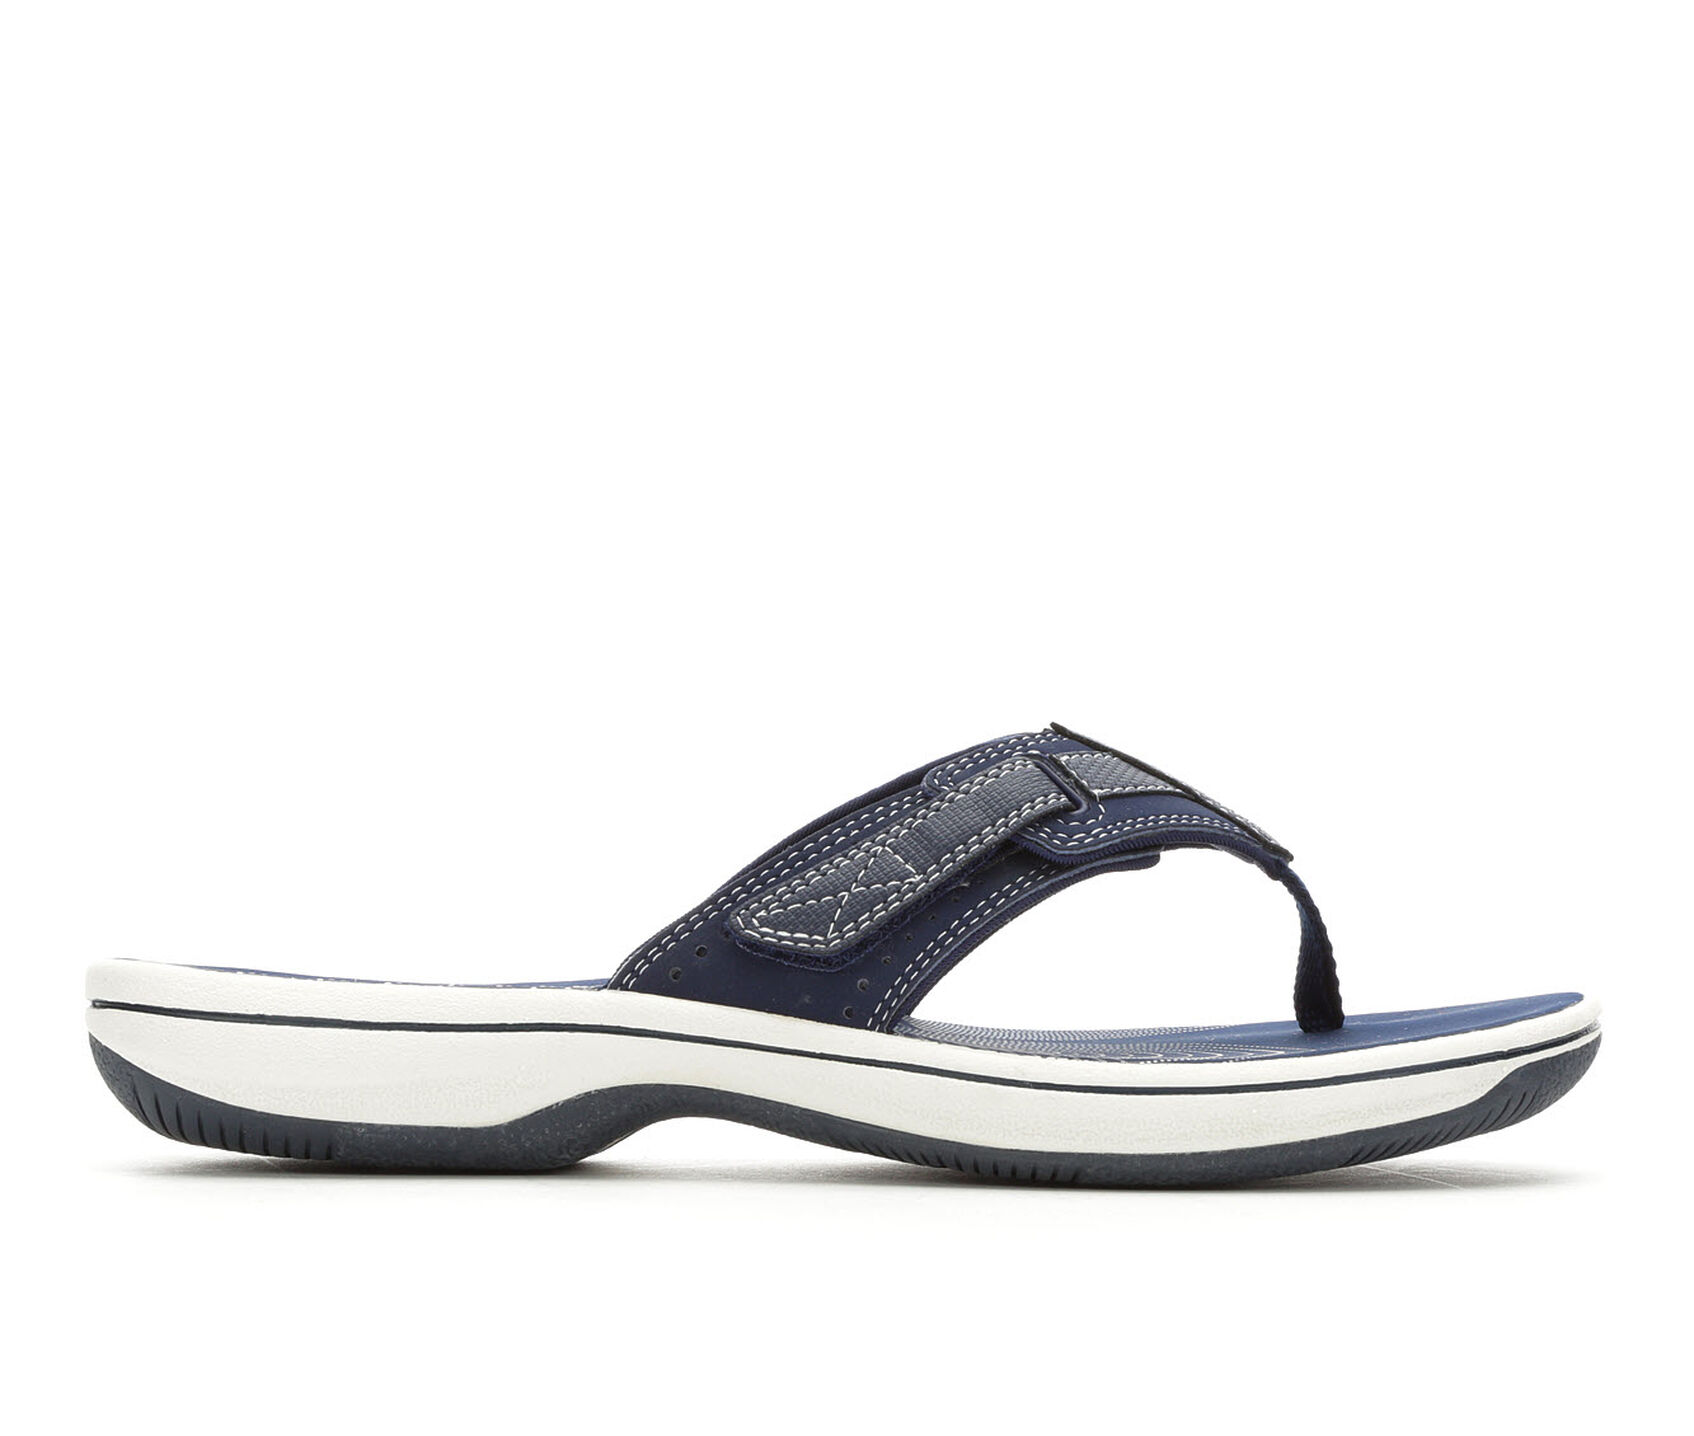 c8d978976 ... Clarks Brinkley Reef Sandals. Previous